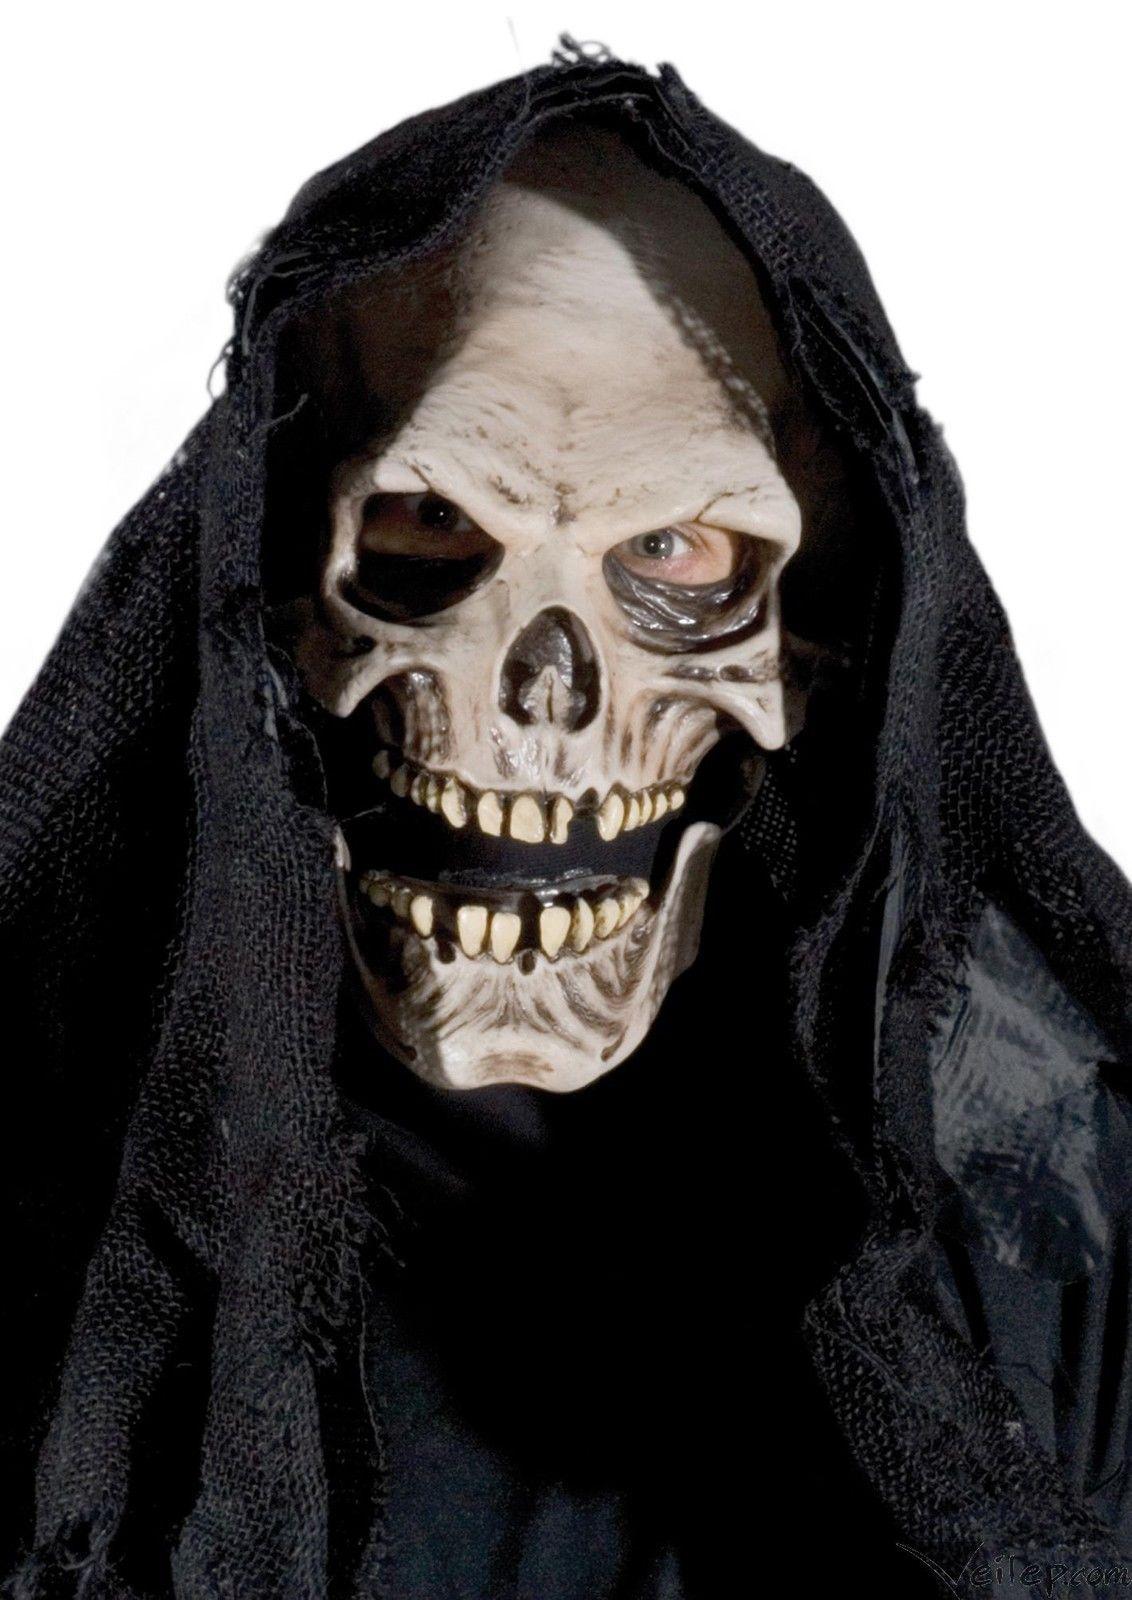 Zagone Grim Reaper Full Head Mask, White, One Size eBay